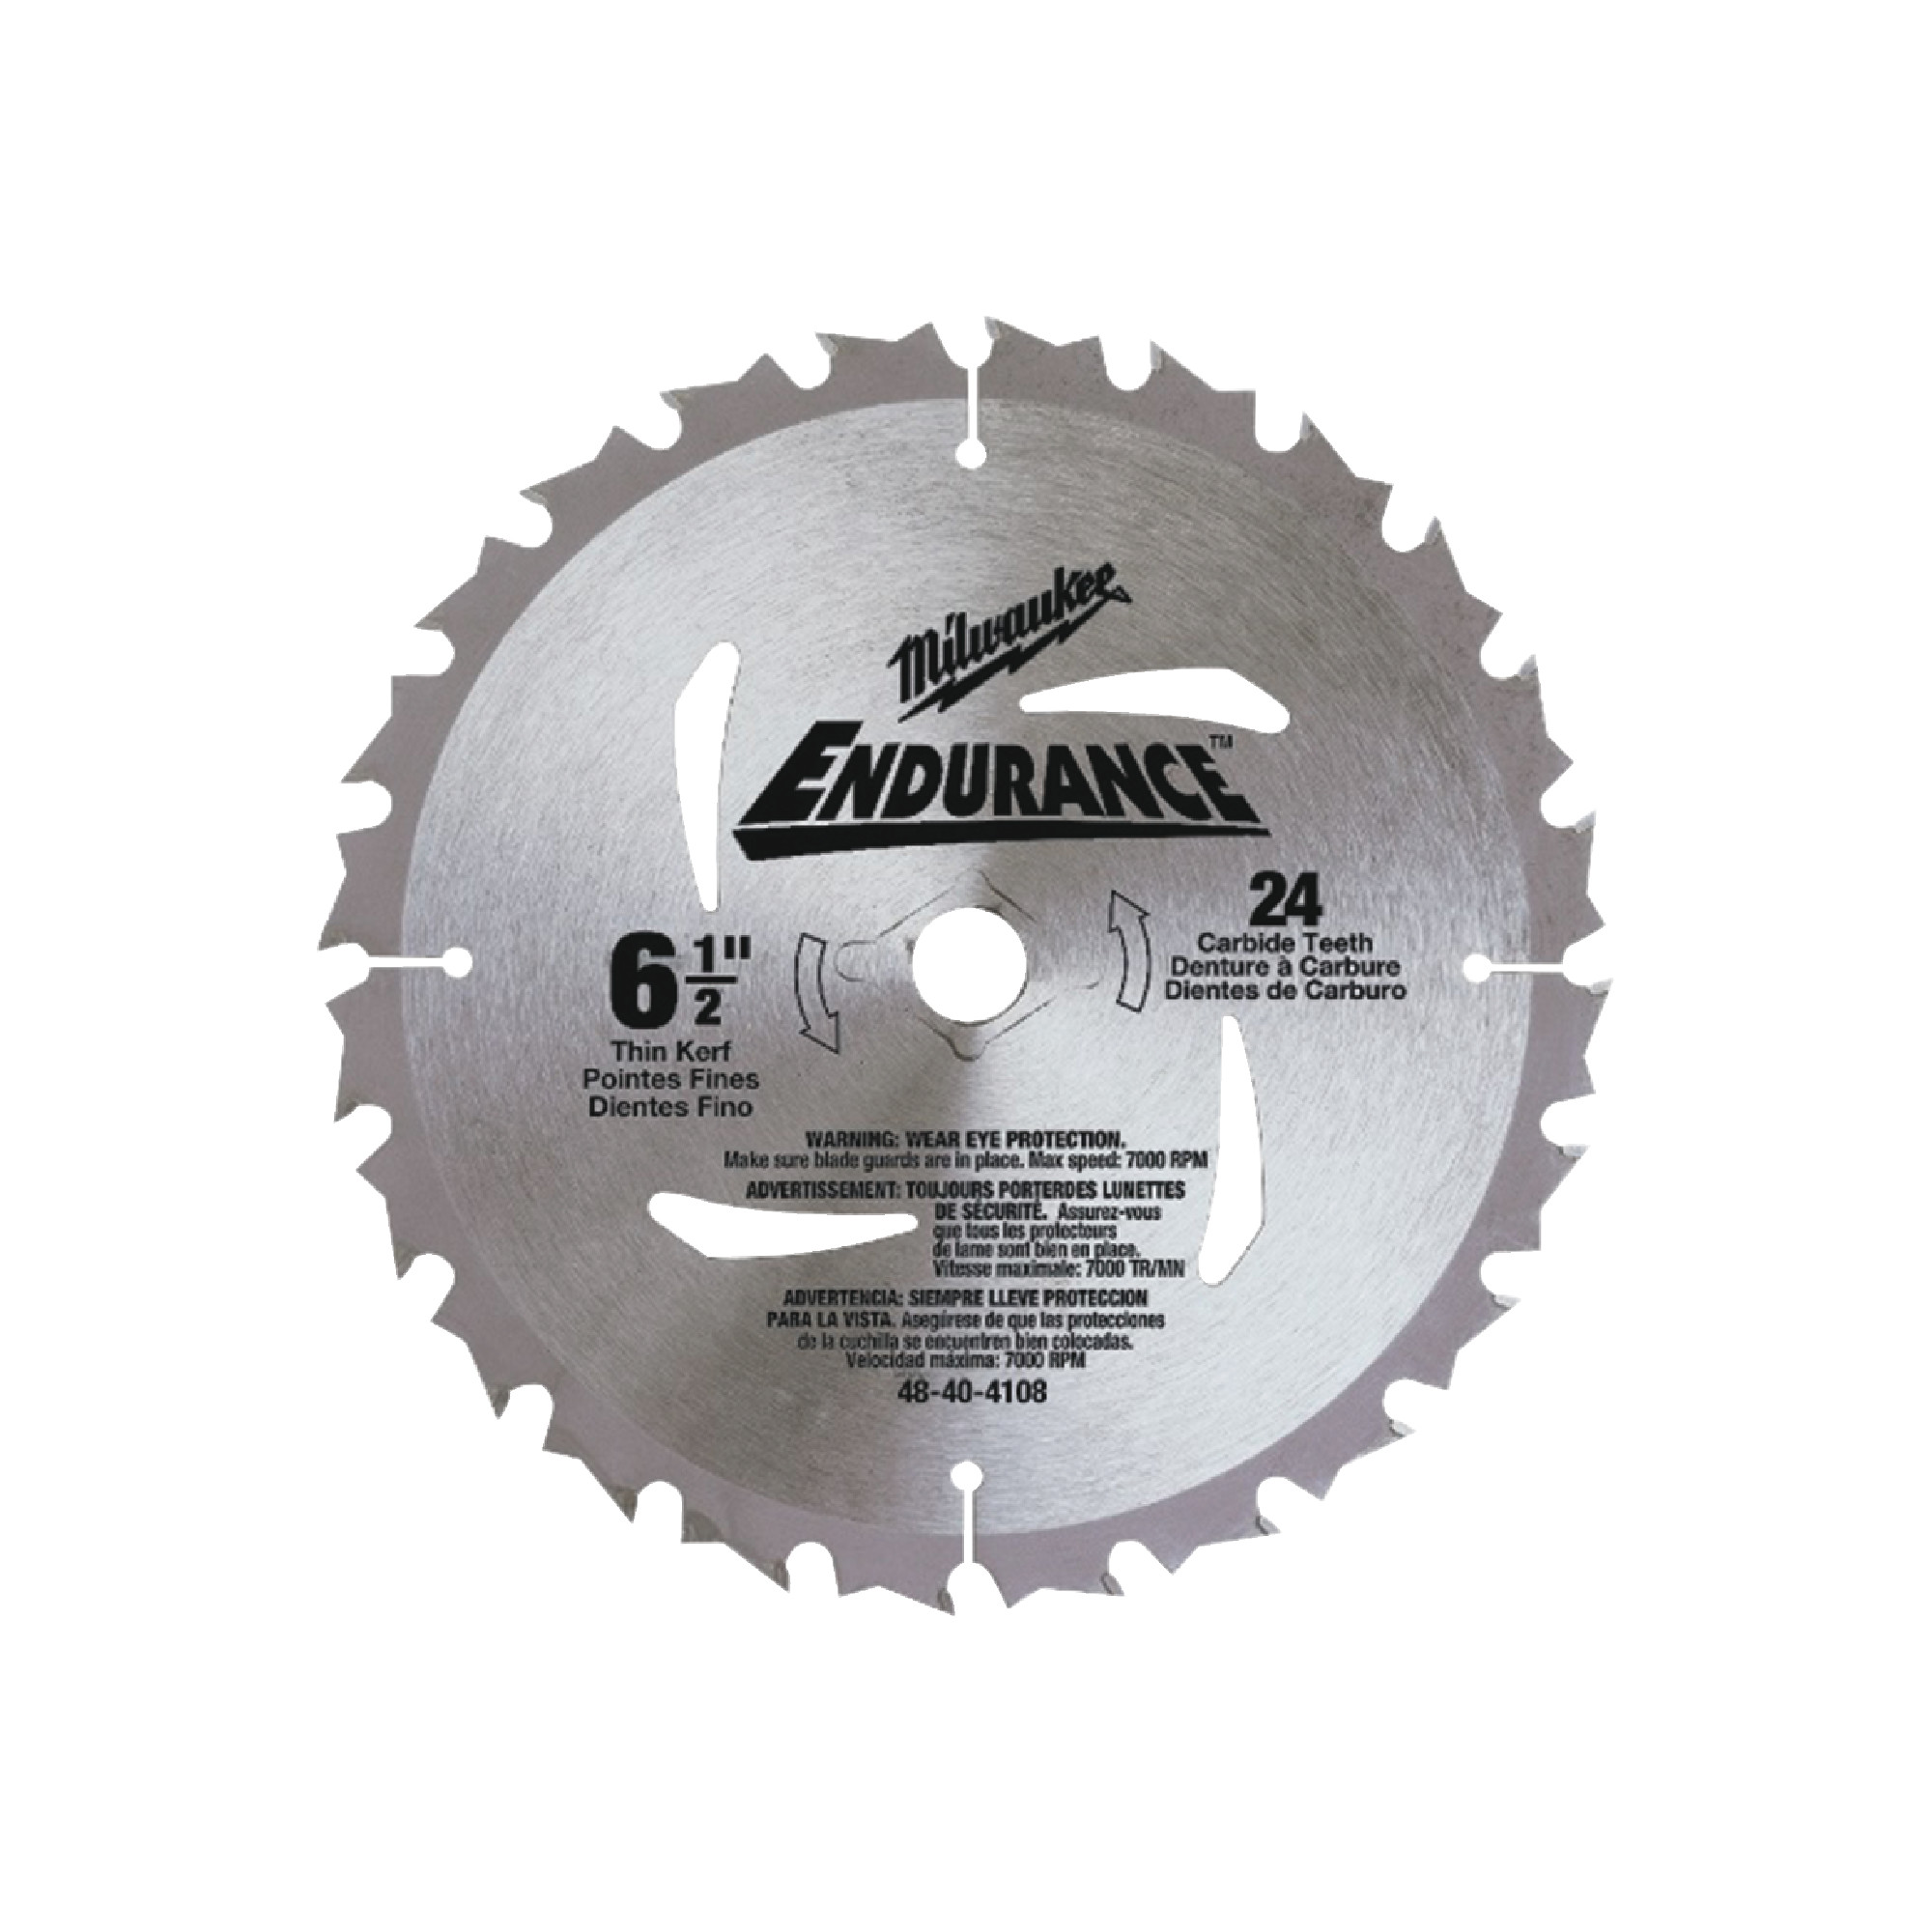 48-40-0620 Wood Cutting Saw Blade - Milwaukee